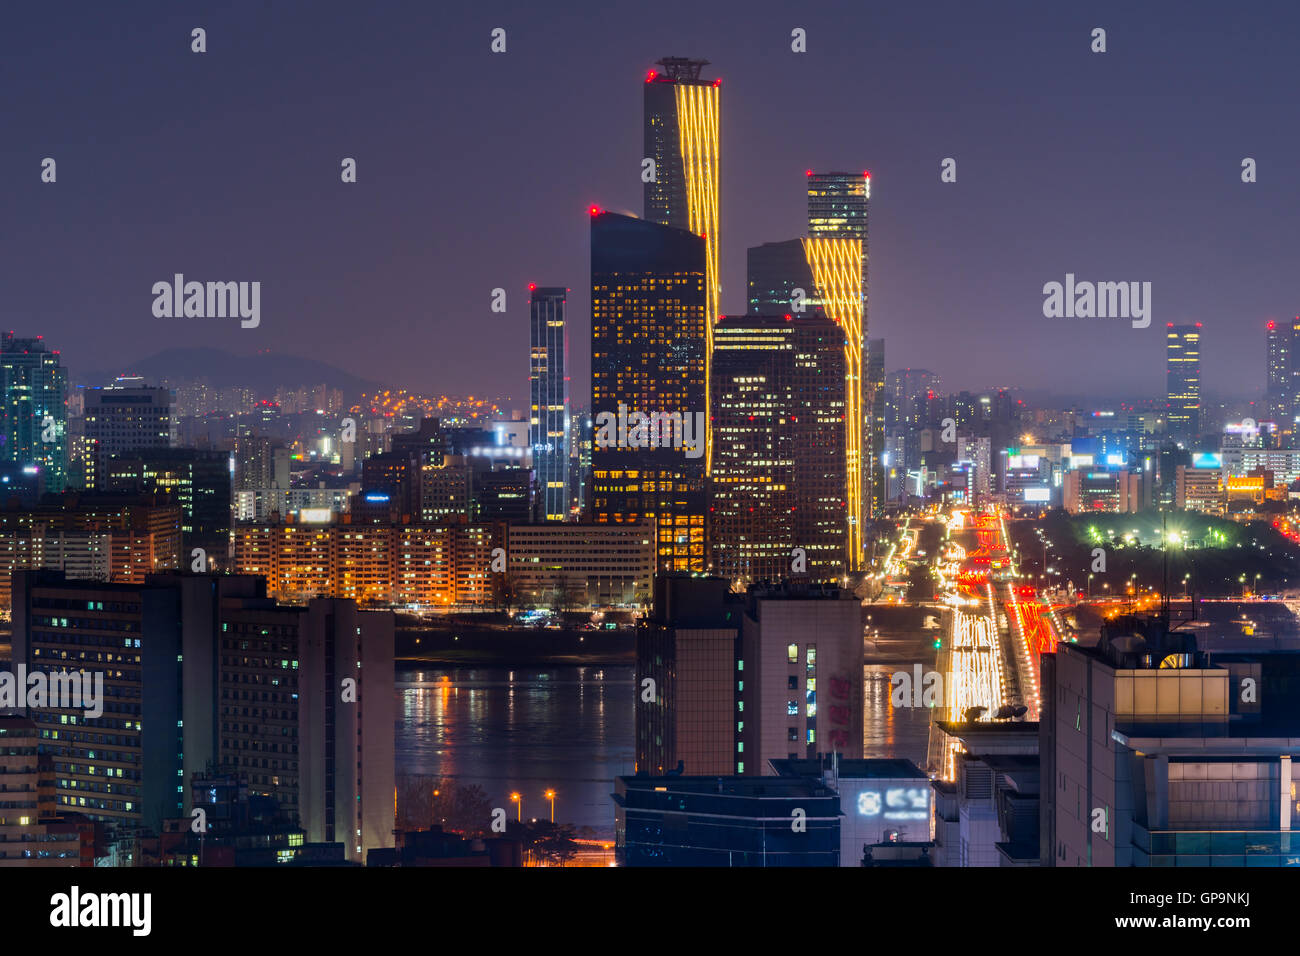 Korea,Seoul at night, South Korea city skyline - Stock Image